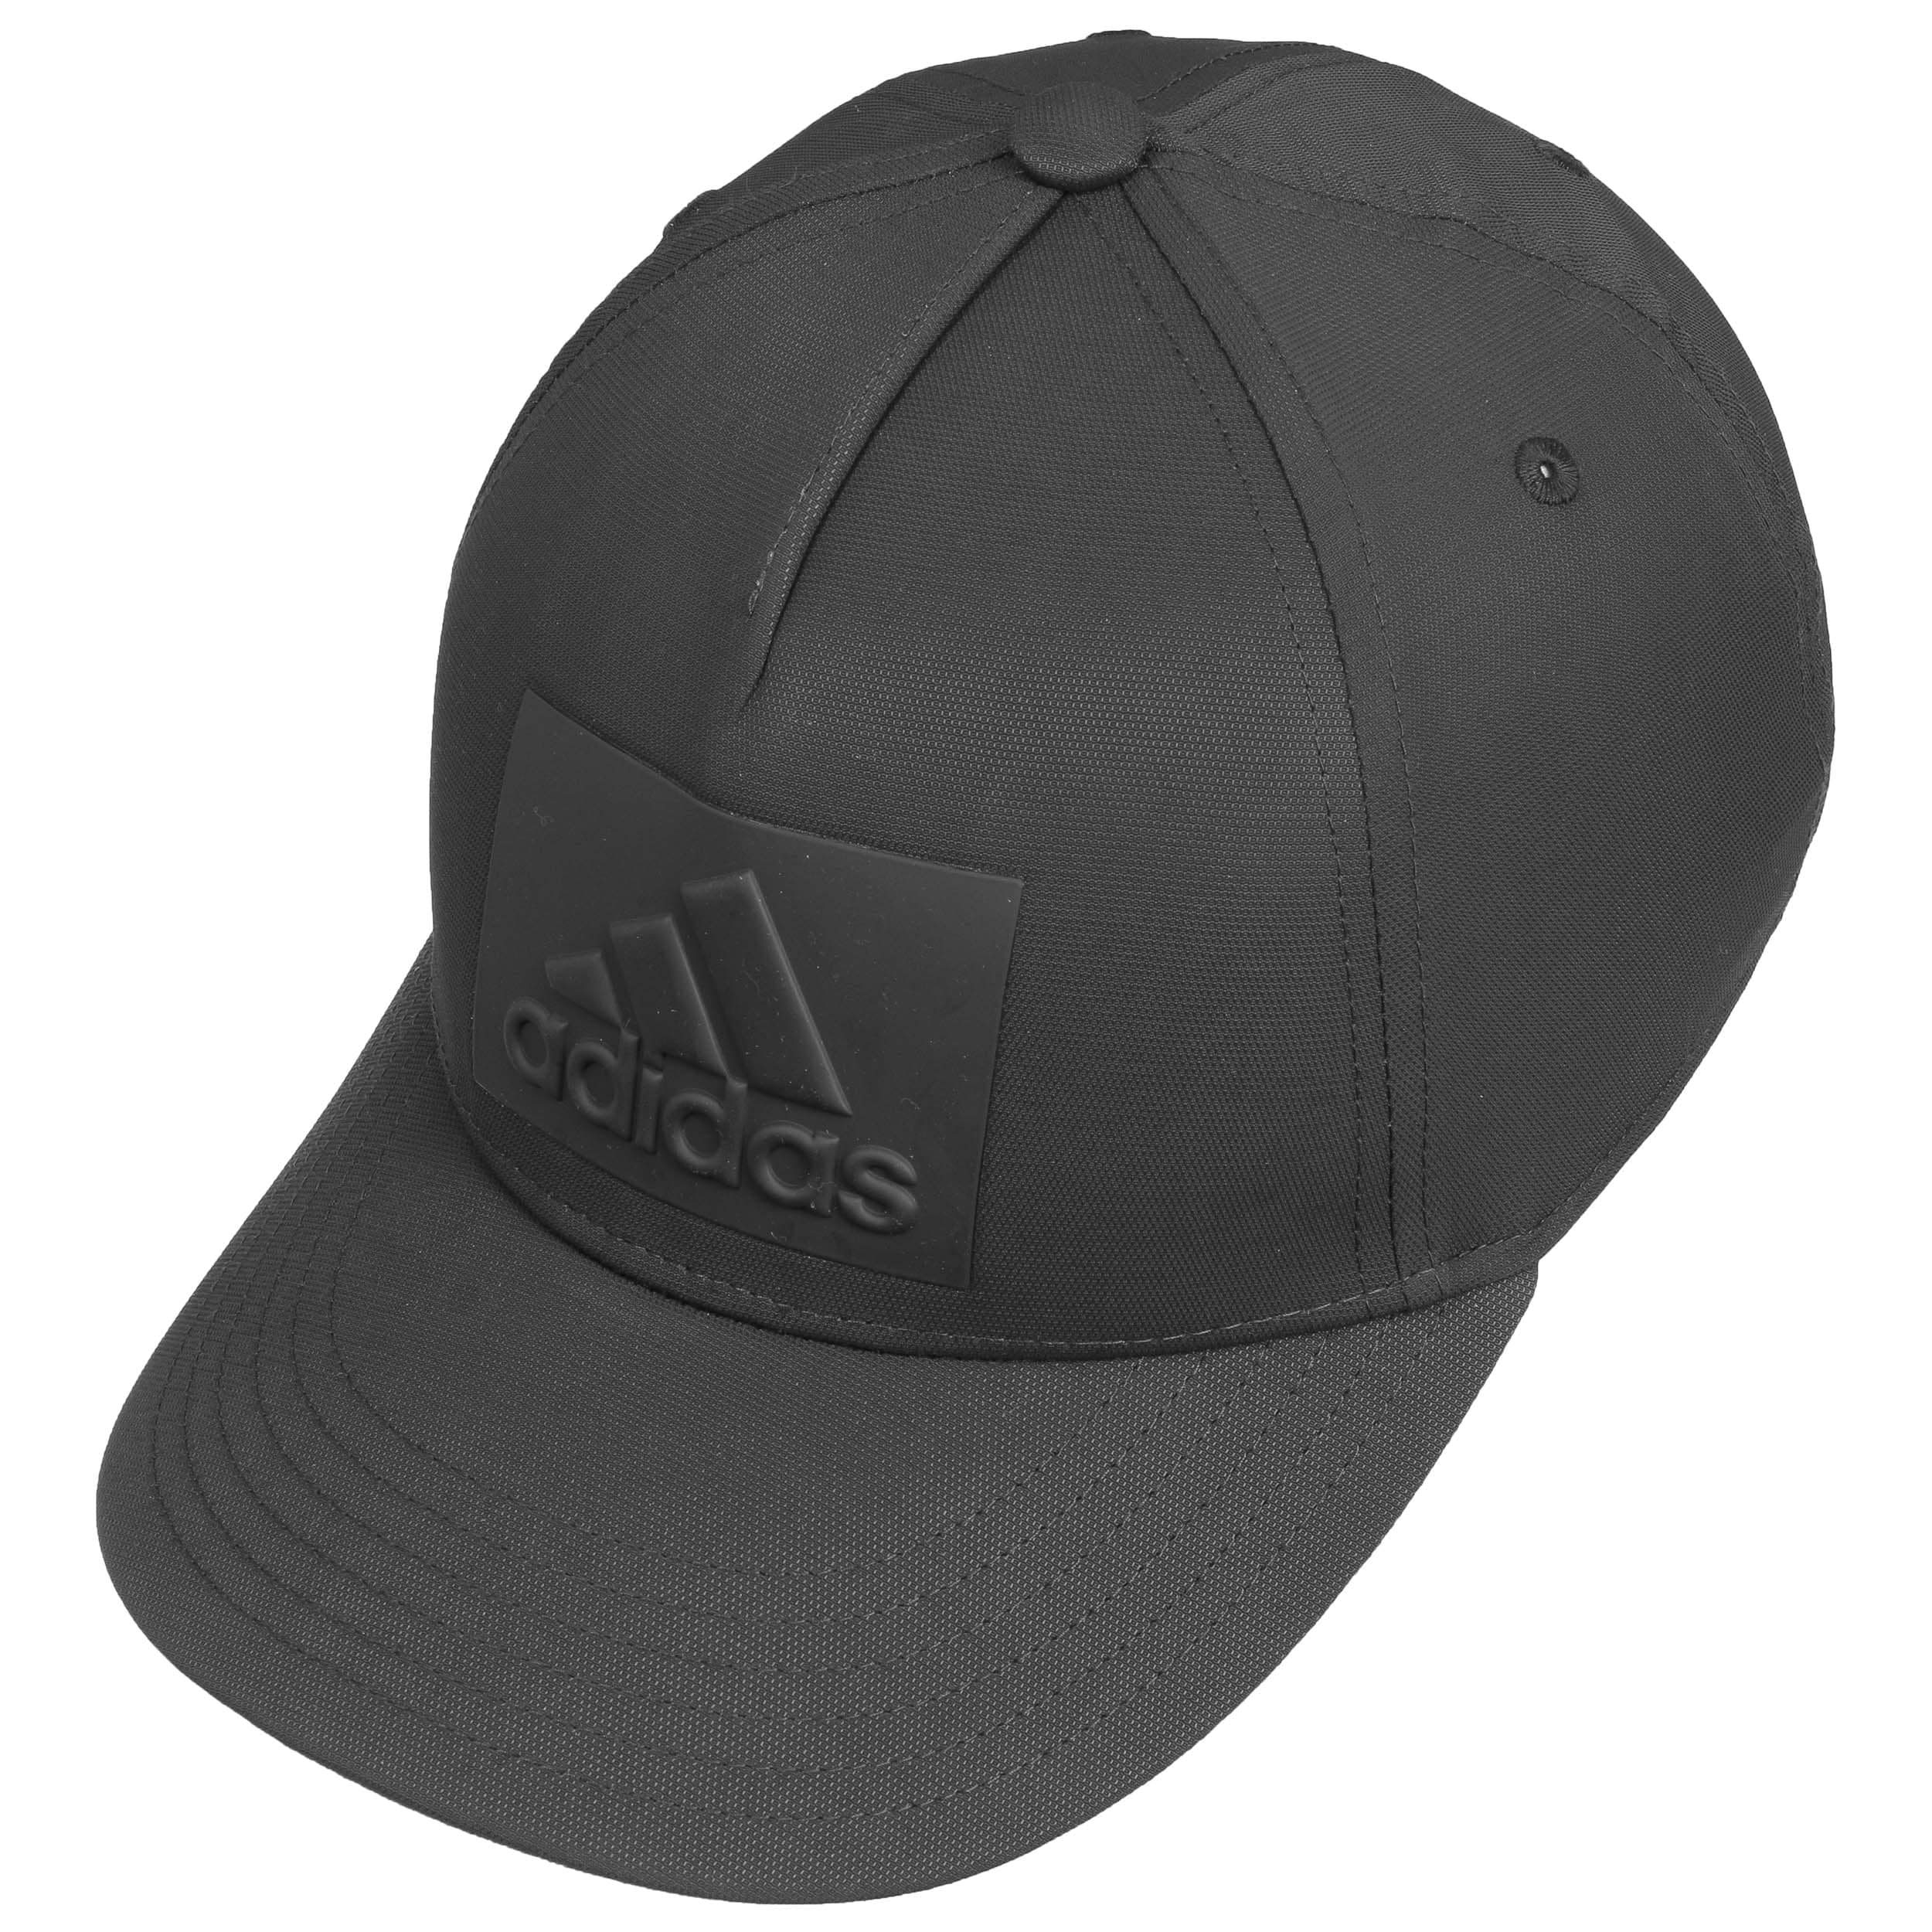 Z.N.E. Logo Cap by adidas - dark grey 1 ... 56d53f772e4